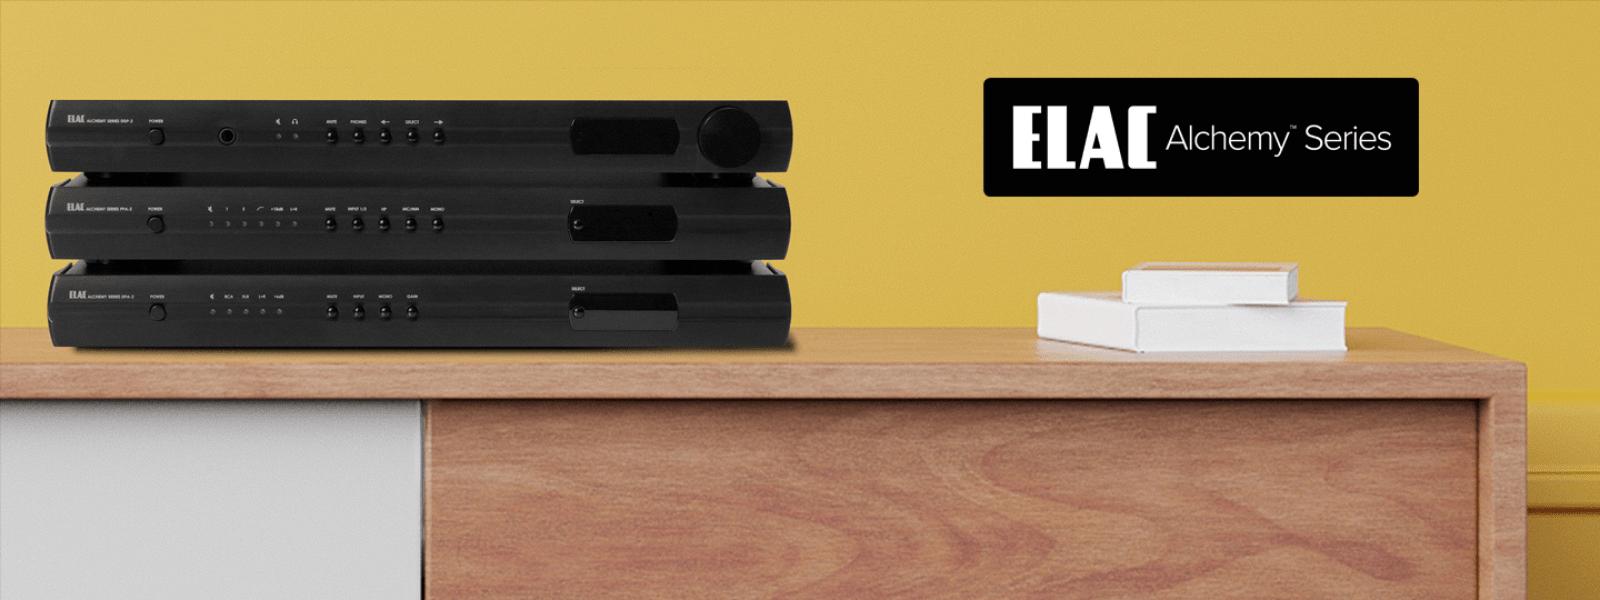 Elac Alchemy Series-min